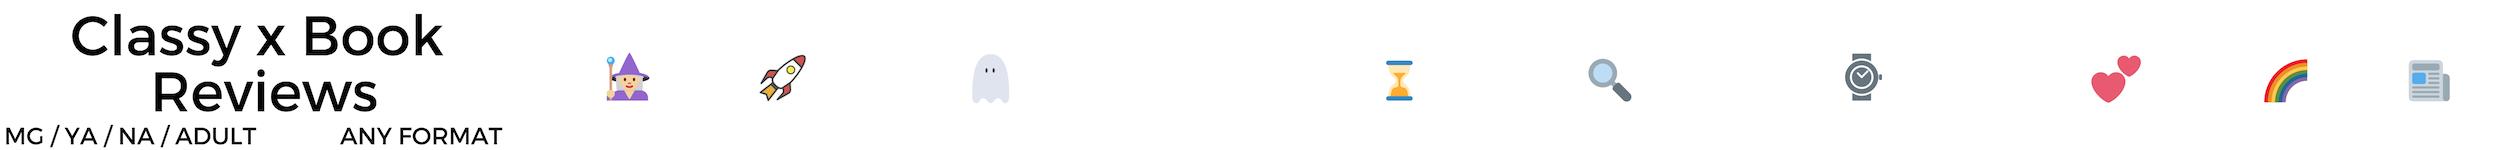 BOOK BLOG COMMUNITY _ BANNER + PROFILES [2500 x 150] (3).jpg